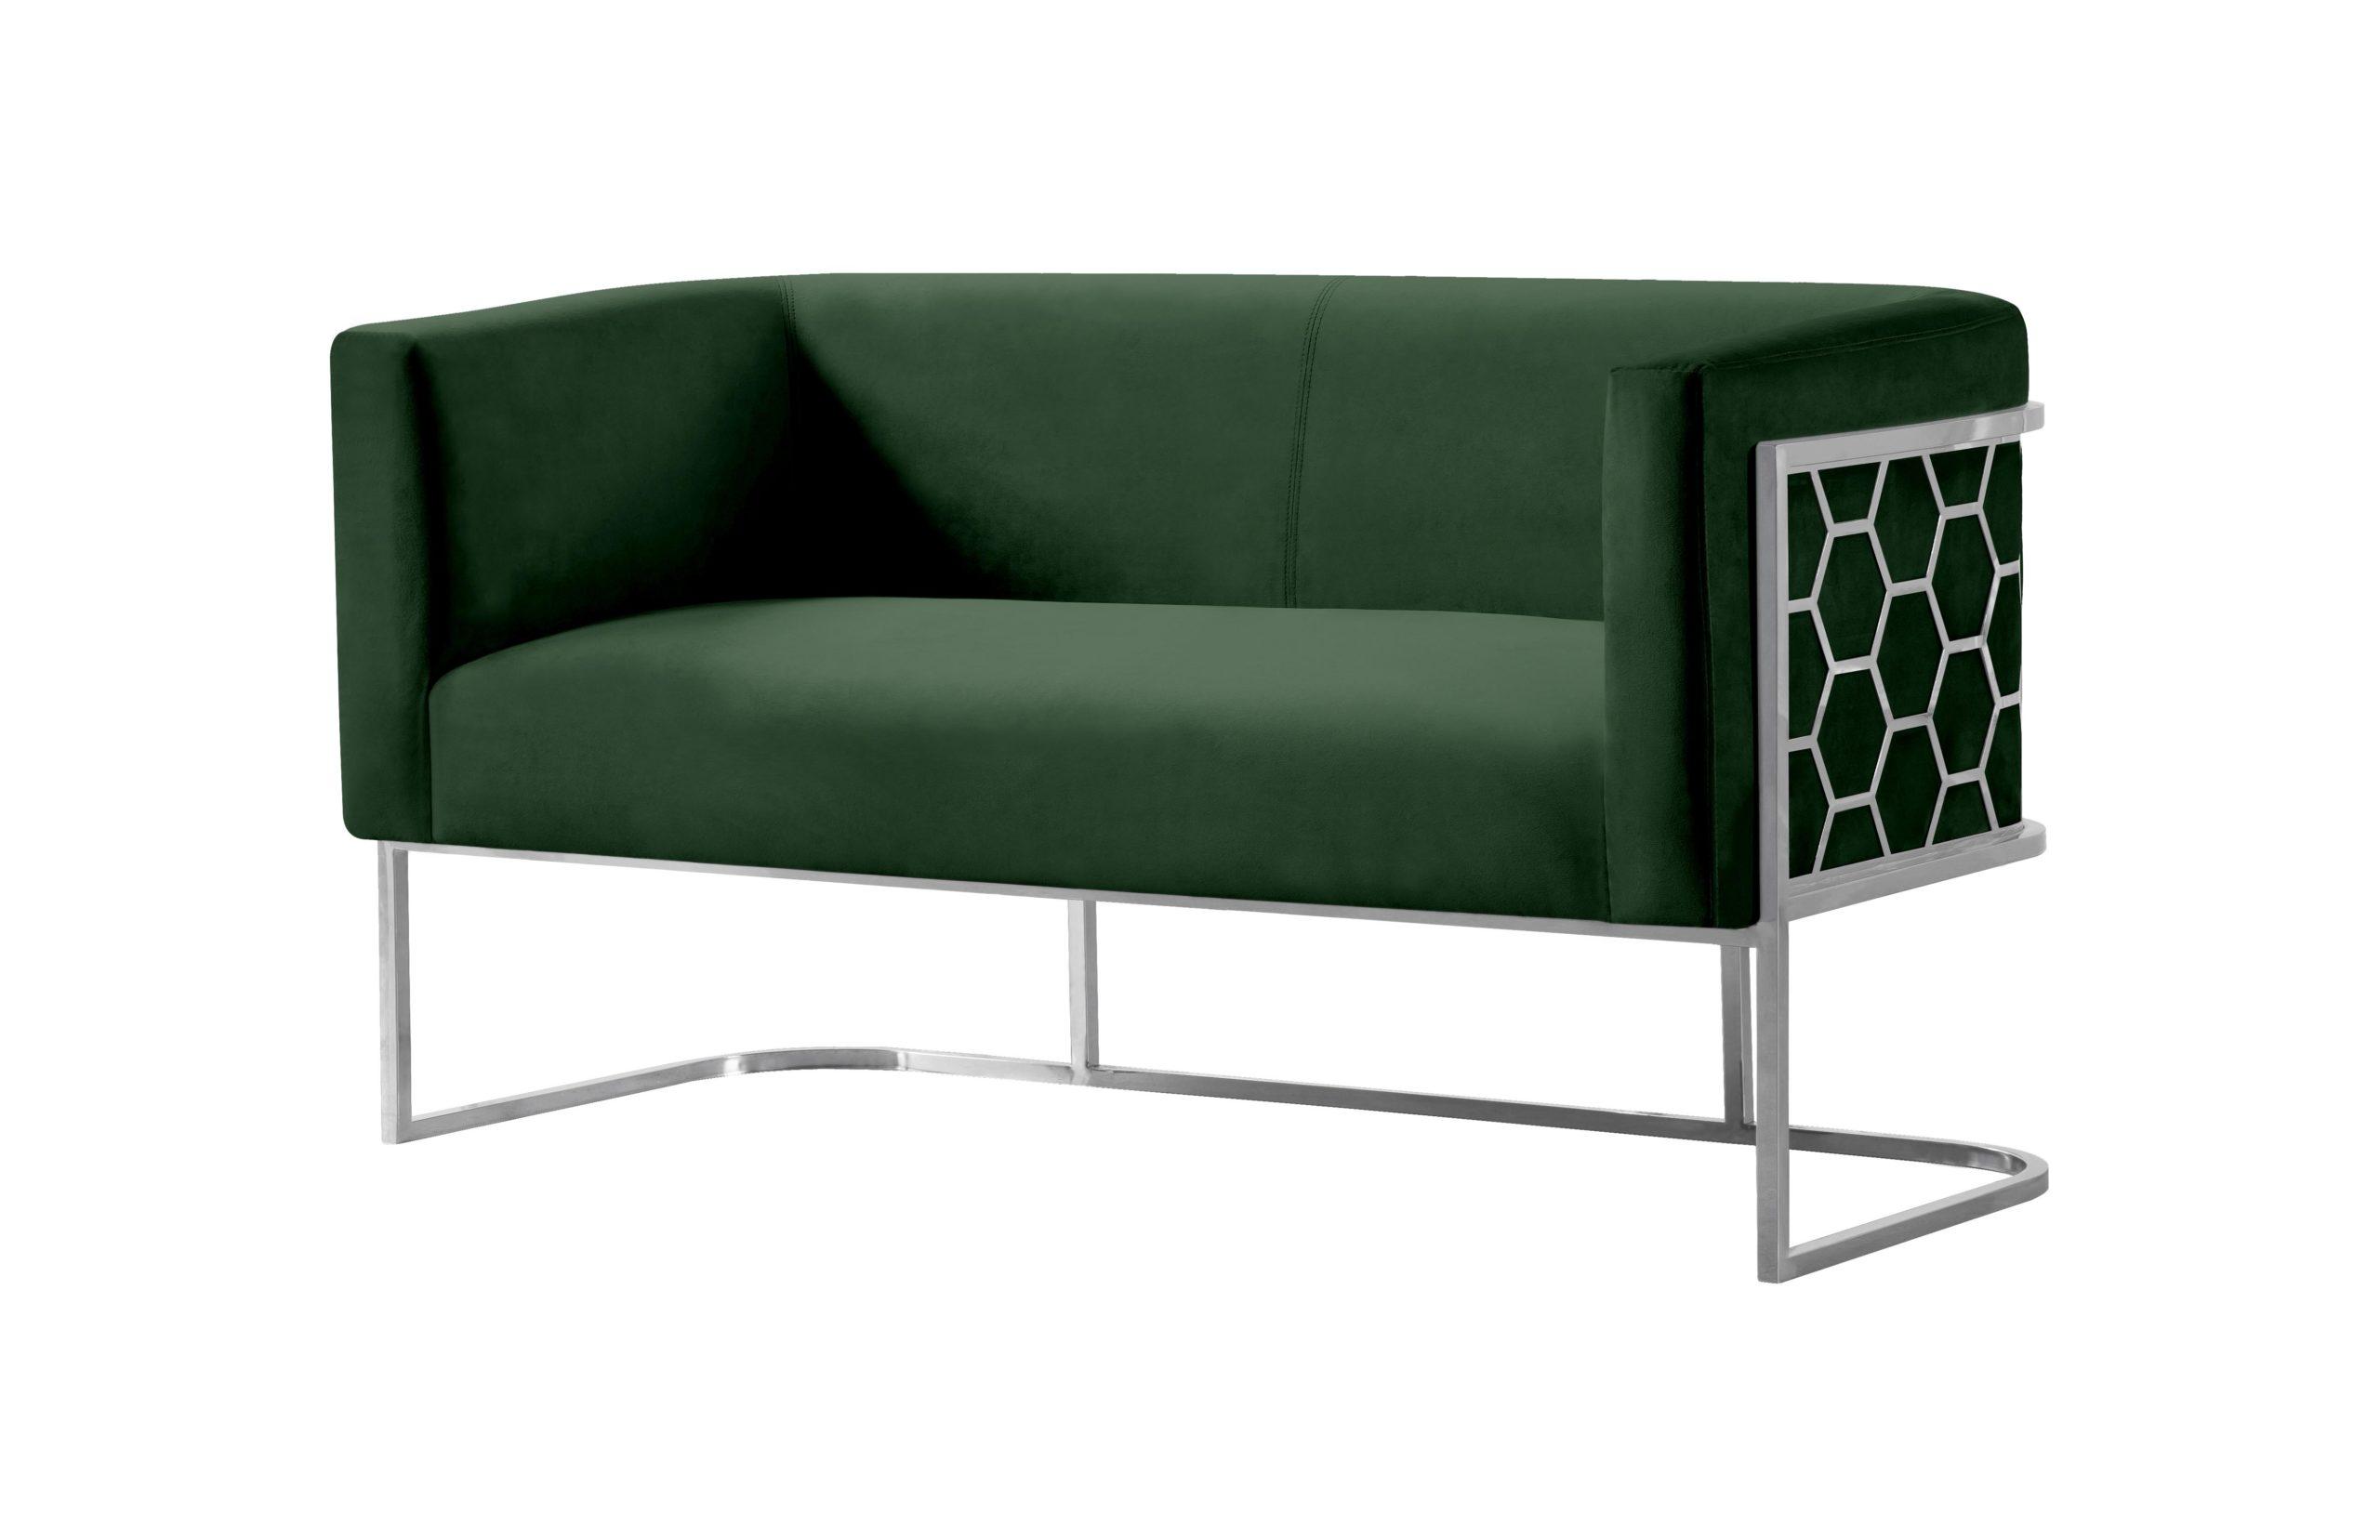 Sofa, £999.99, MY Furniture